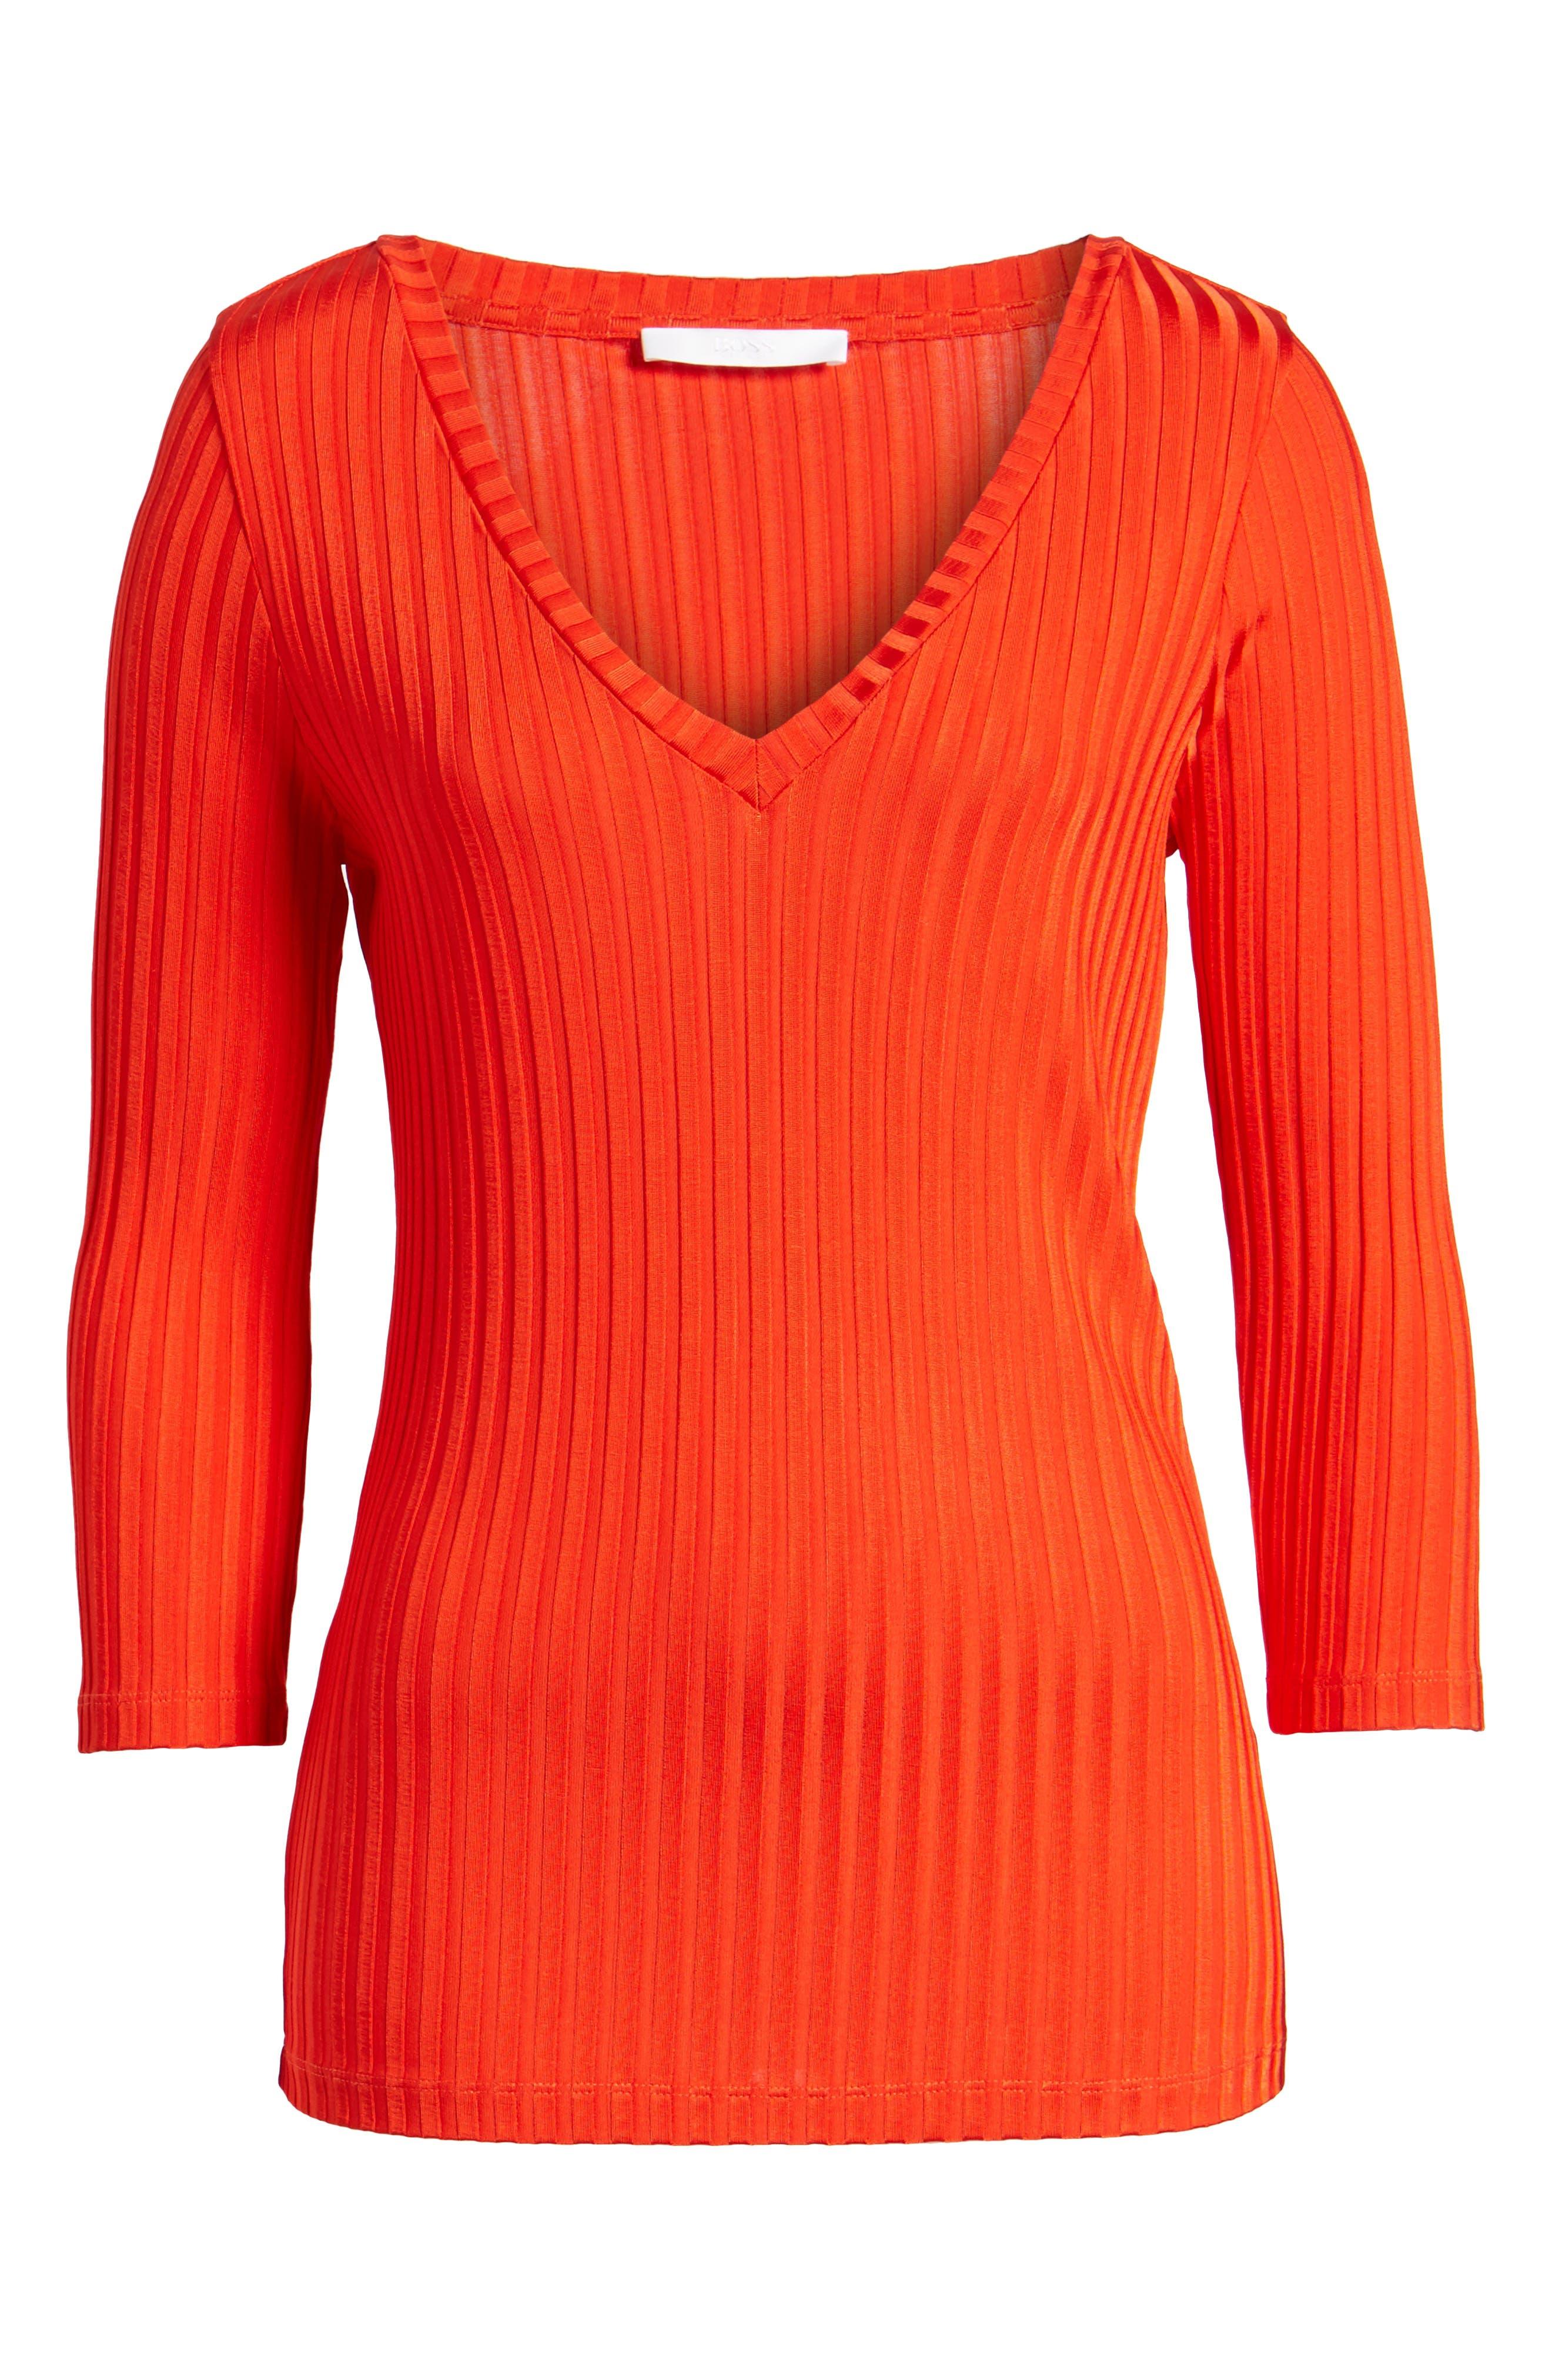 Etrica V-Neck Ribbed Top,                             Alternate thumbnail 7, color,                             Sunset Orange